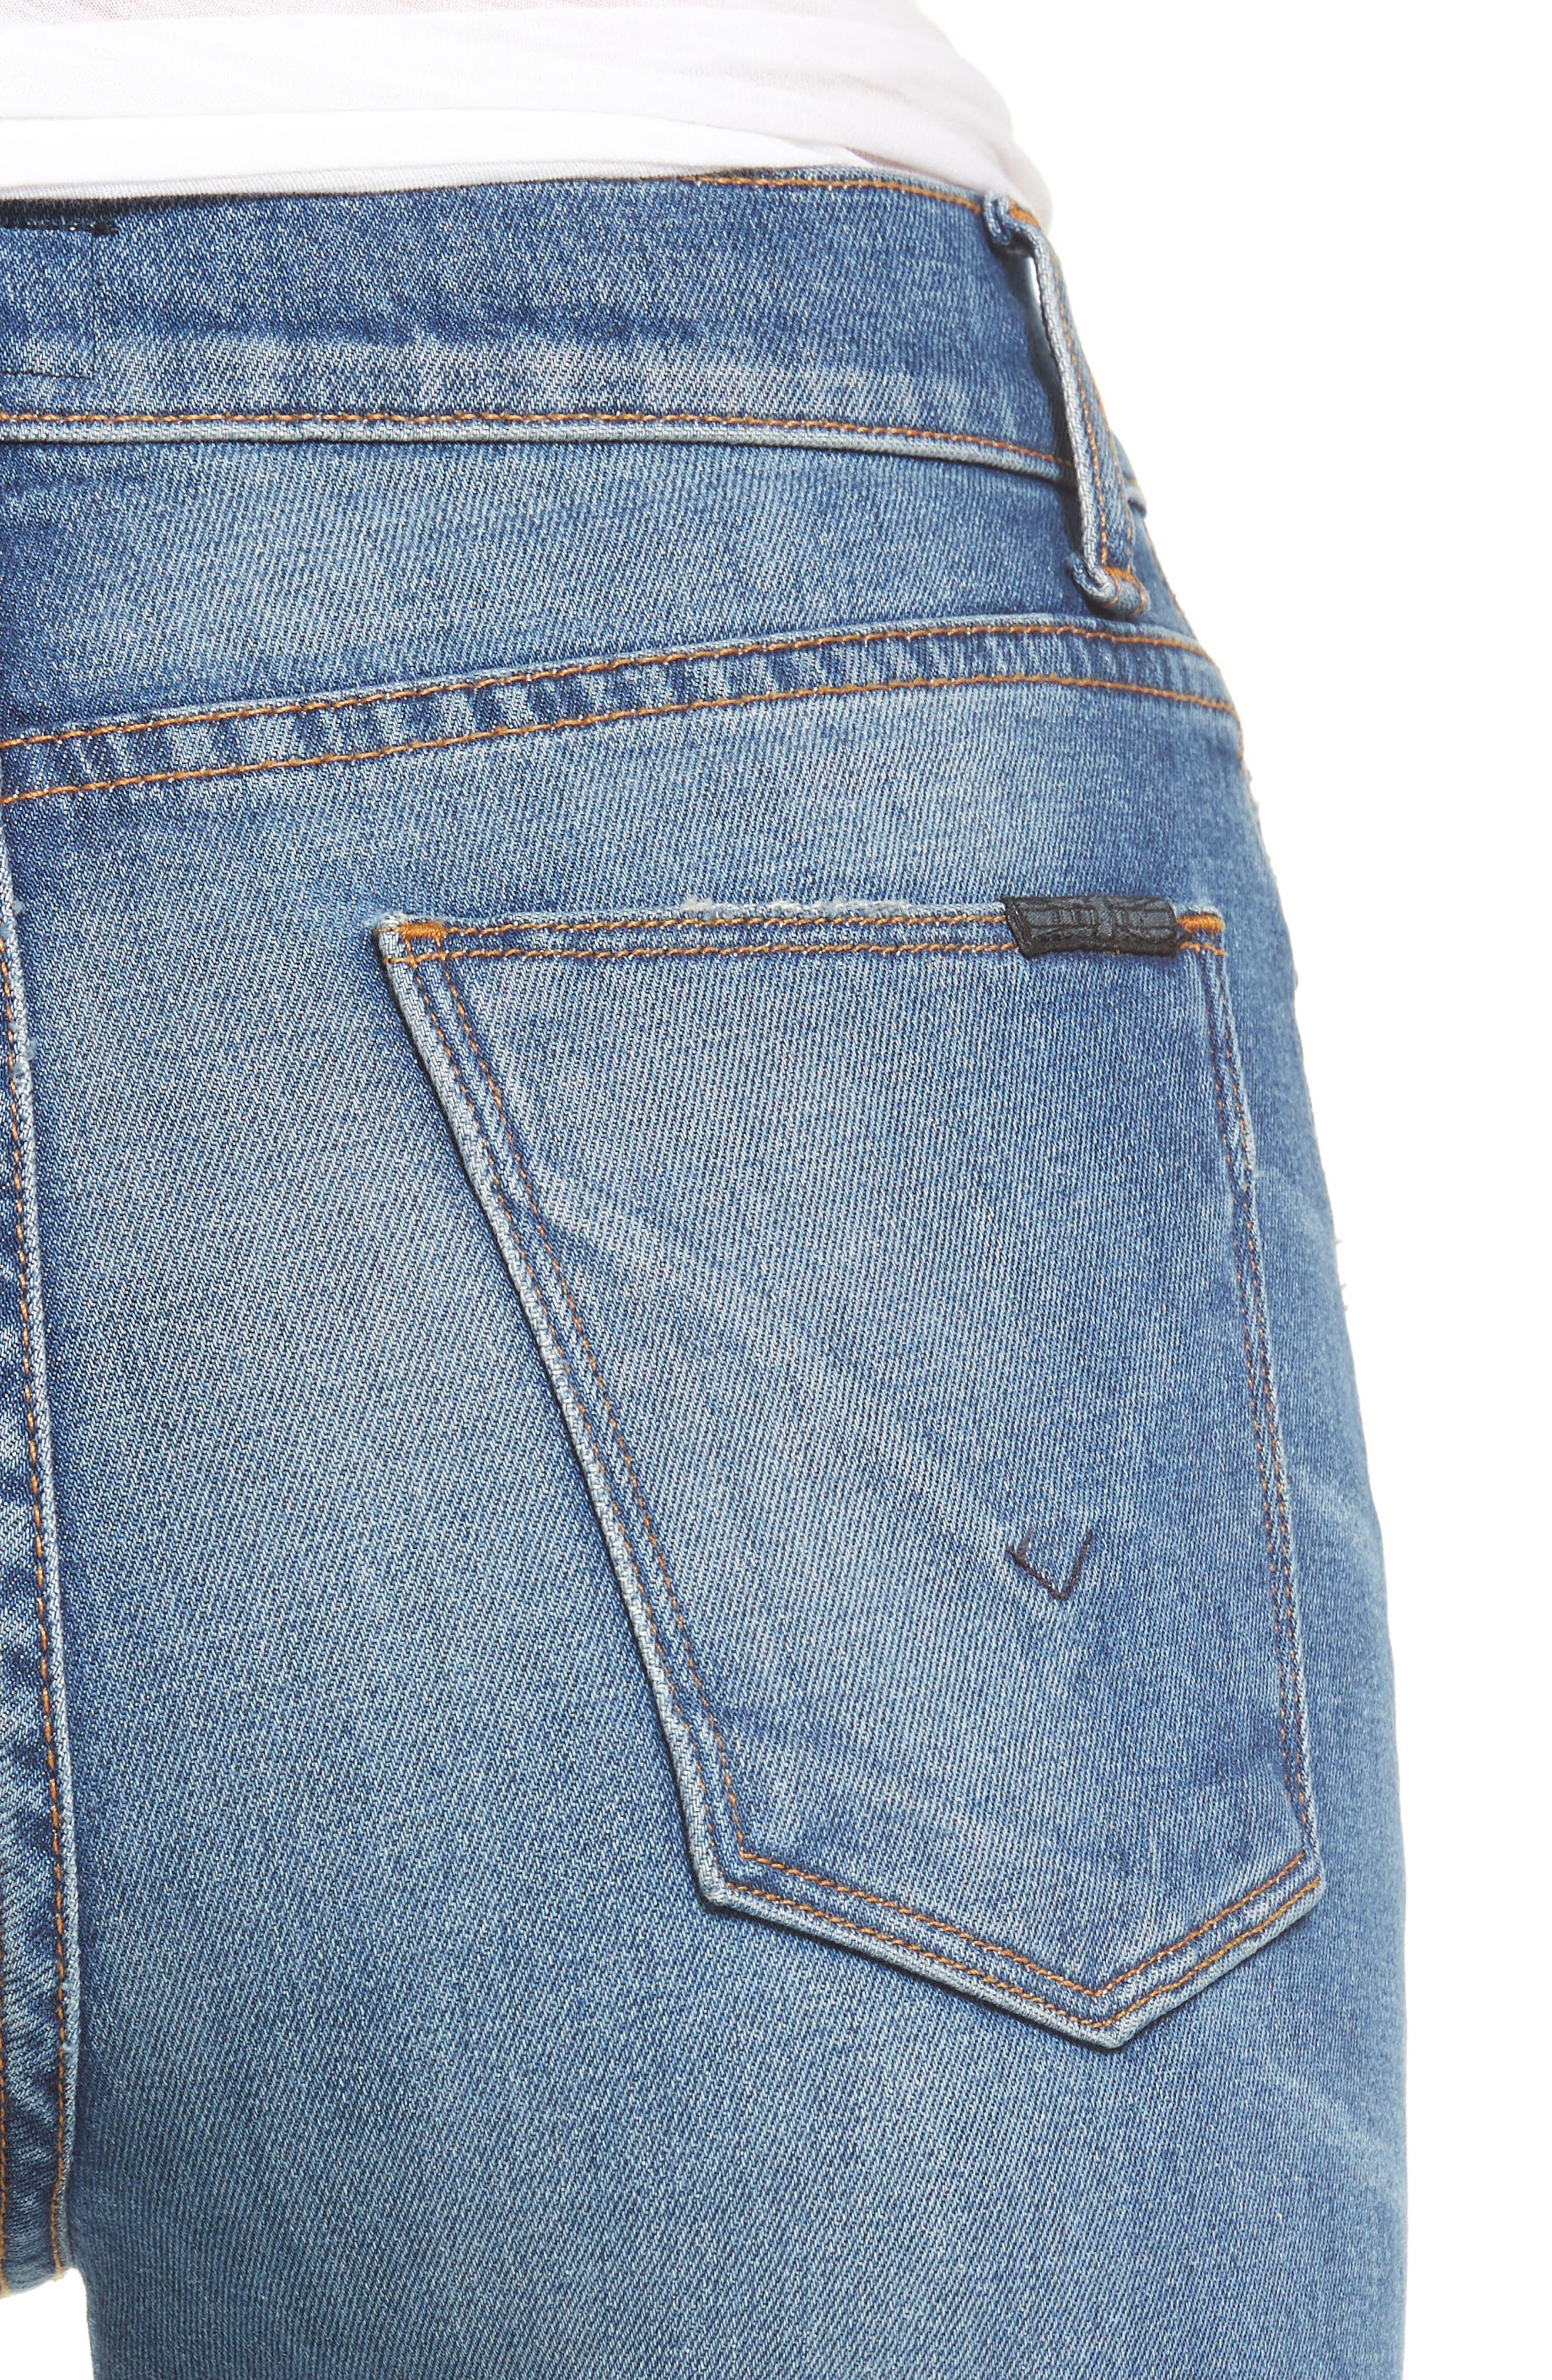 Zoeey High Waist Ankle Straight Leg Jeans,                             Alternate thumbnail 4, color,                             Kool